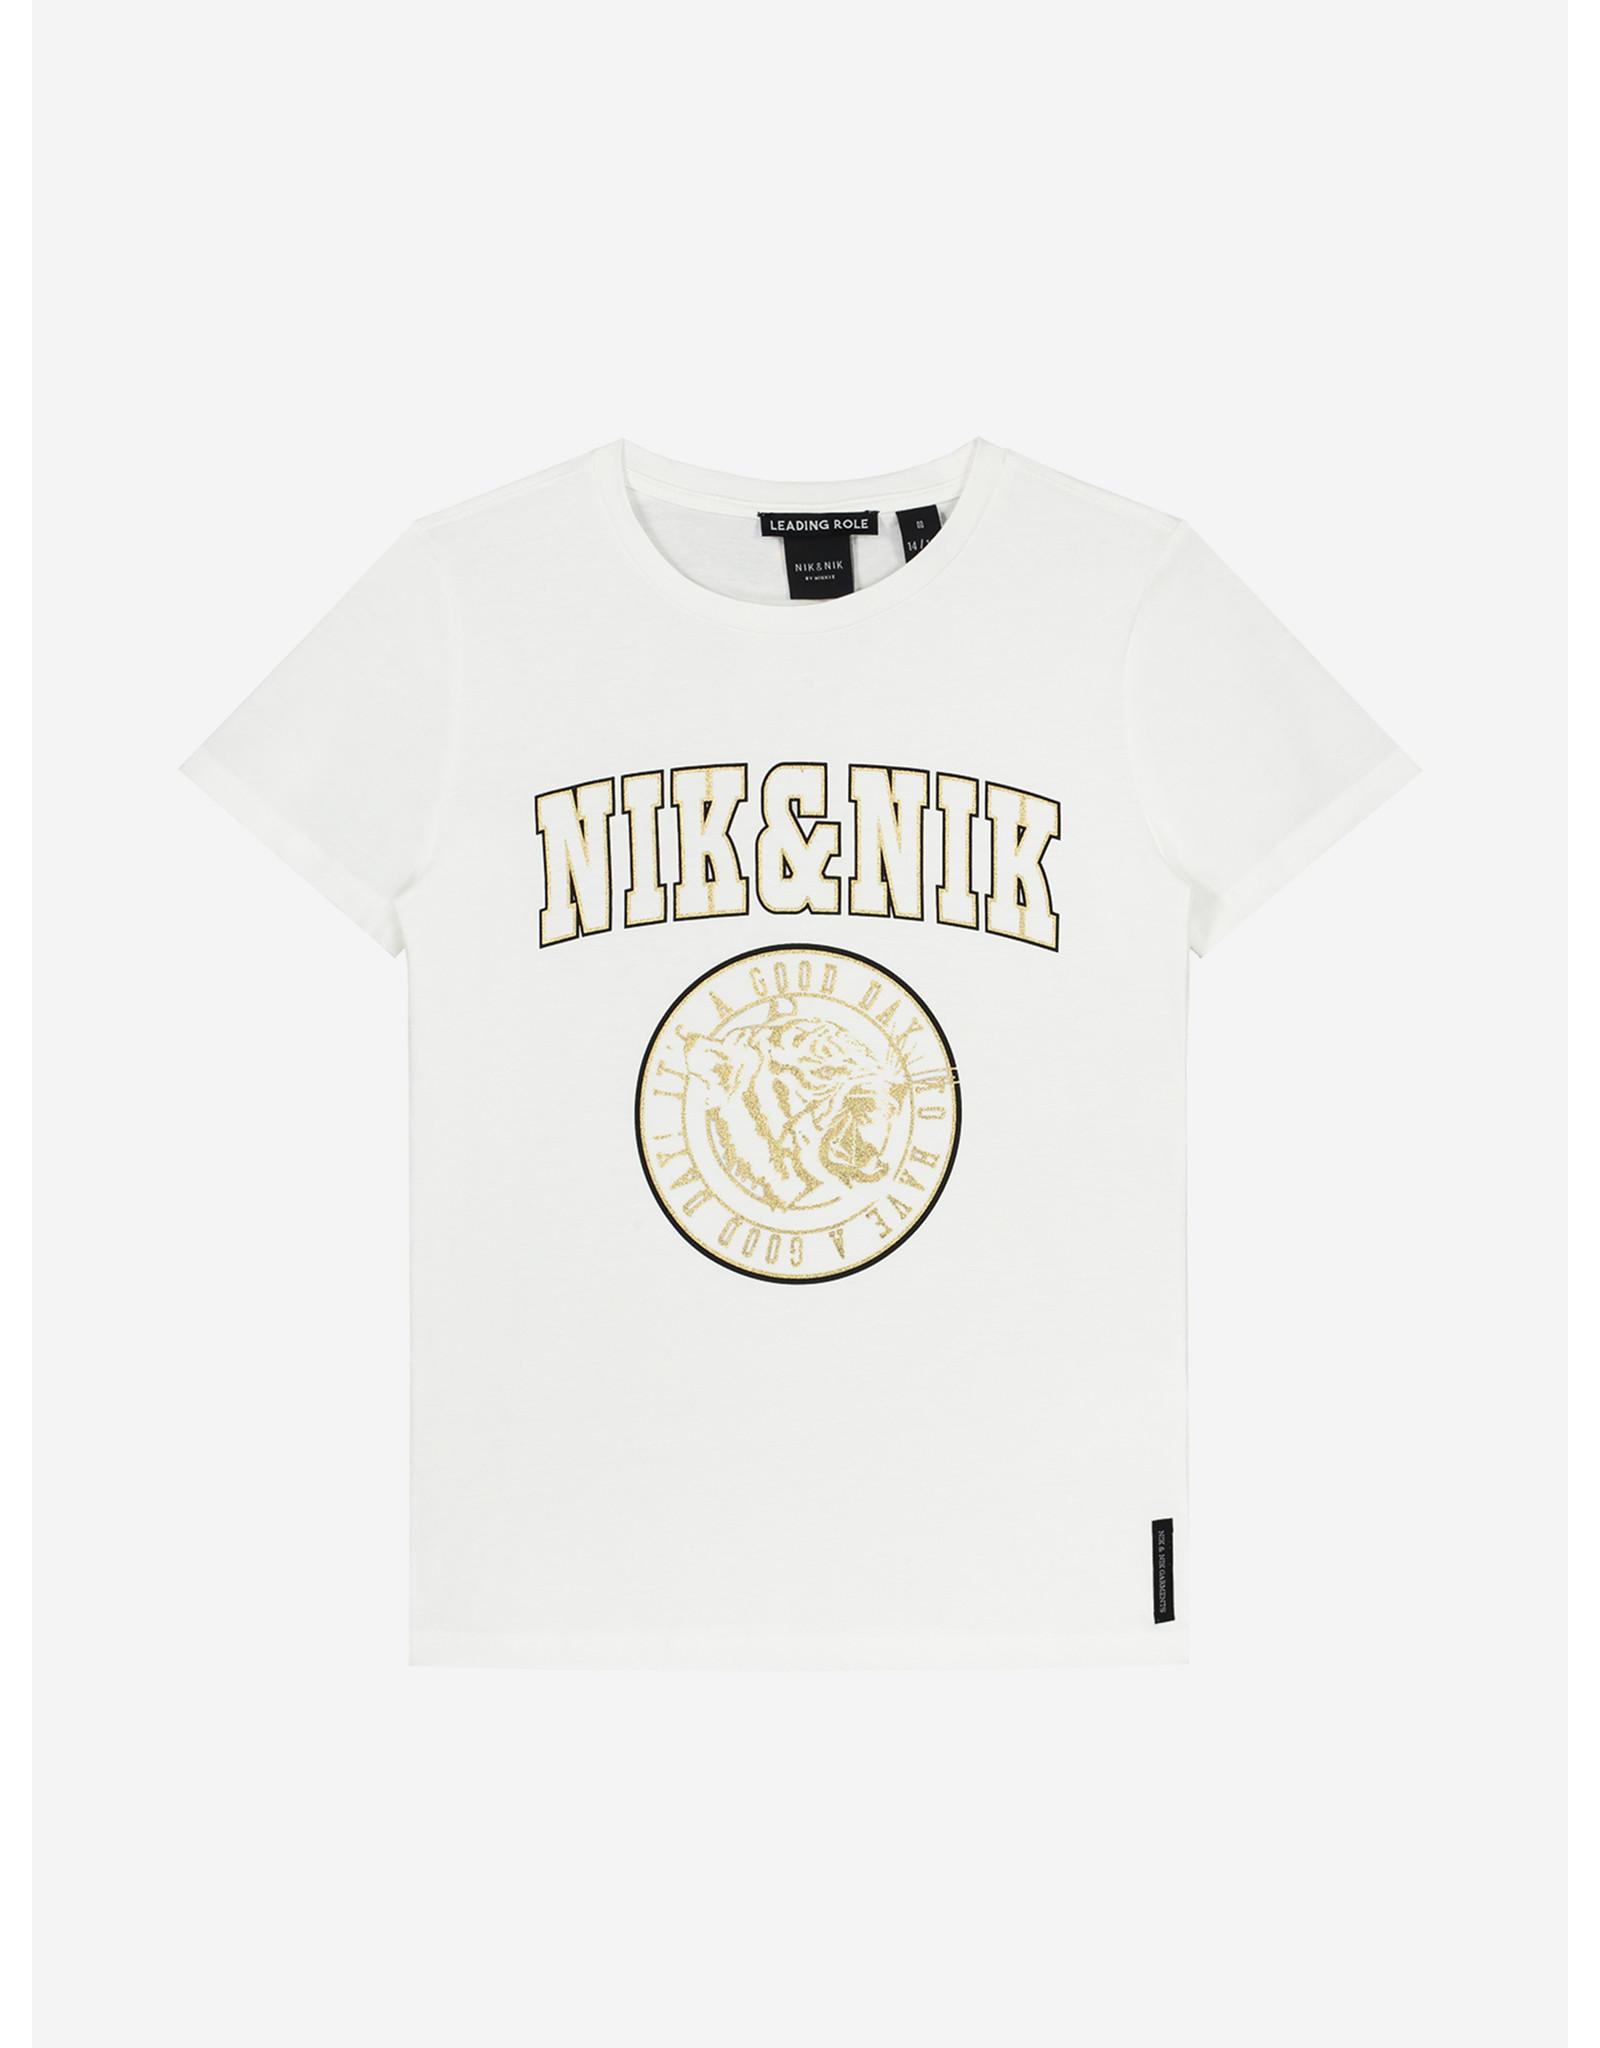 Nik&Nik NIK&NIK Poppy T-shirt Off White